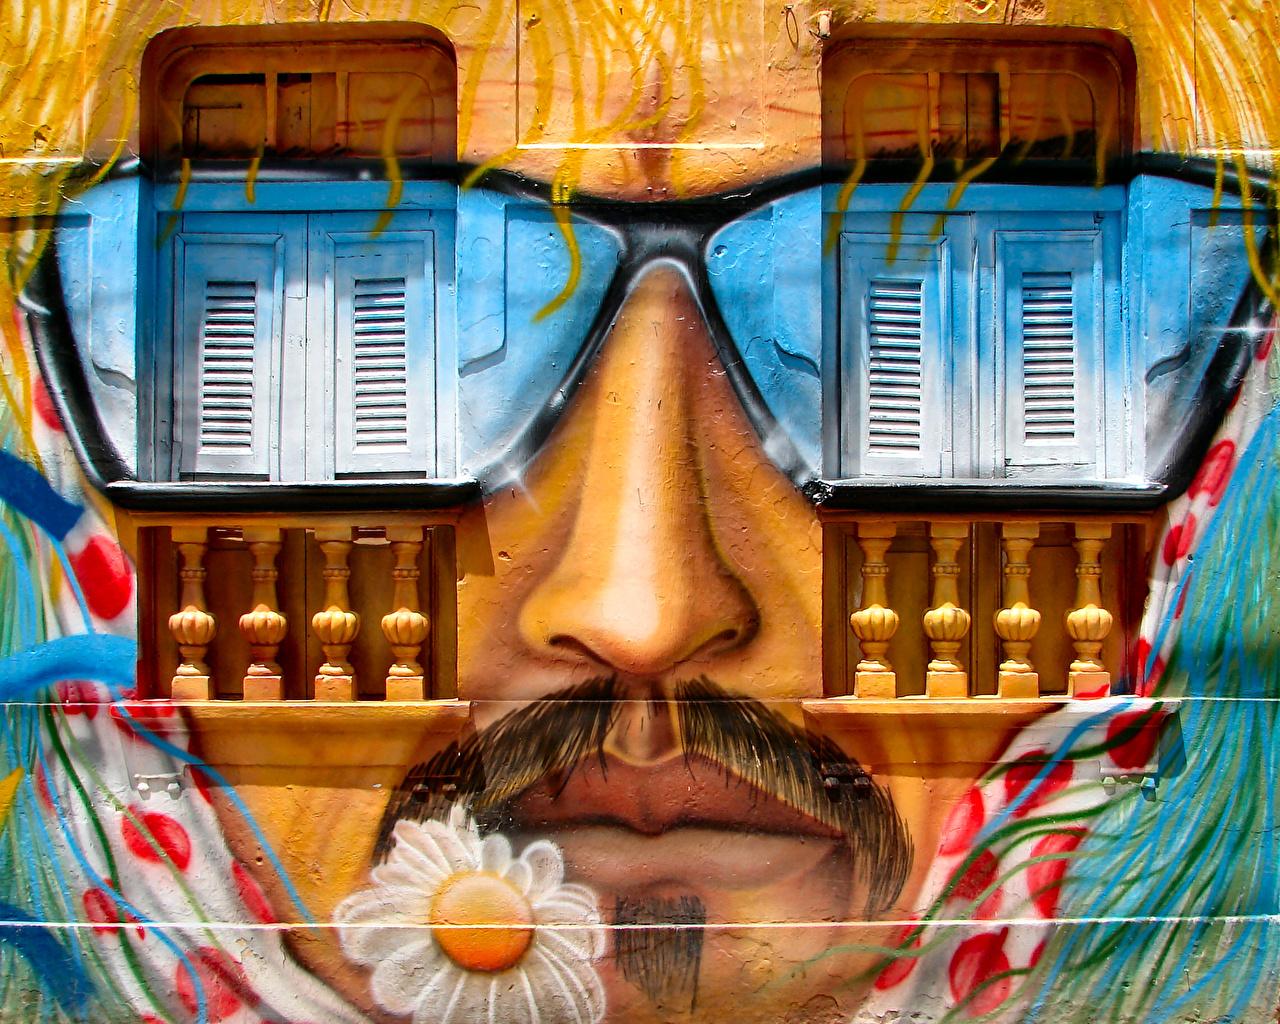 Desktop Wallpapers Man Face Graffiti walls Window Glasses Men Wall eyeglasses